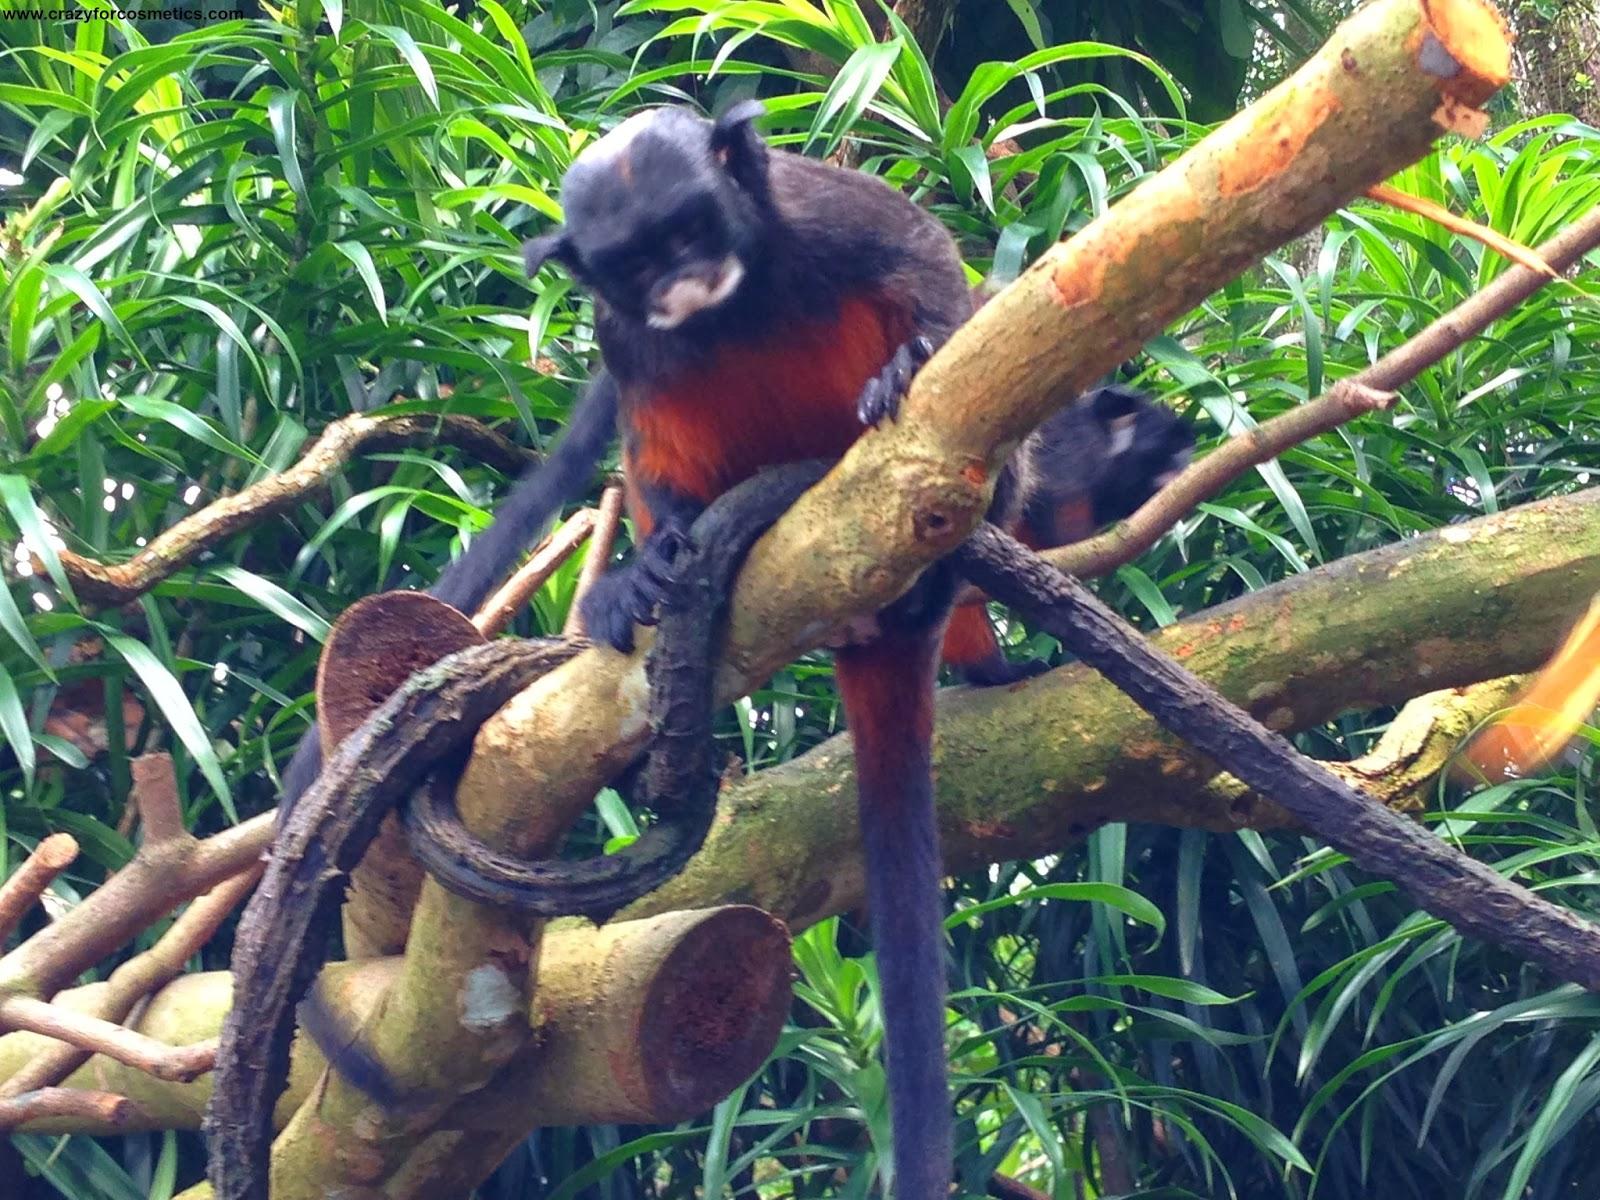 Singapore zoo monkeys- singapore zoo location-singapore zoo rainforest